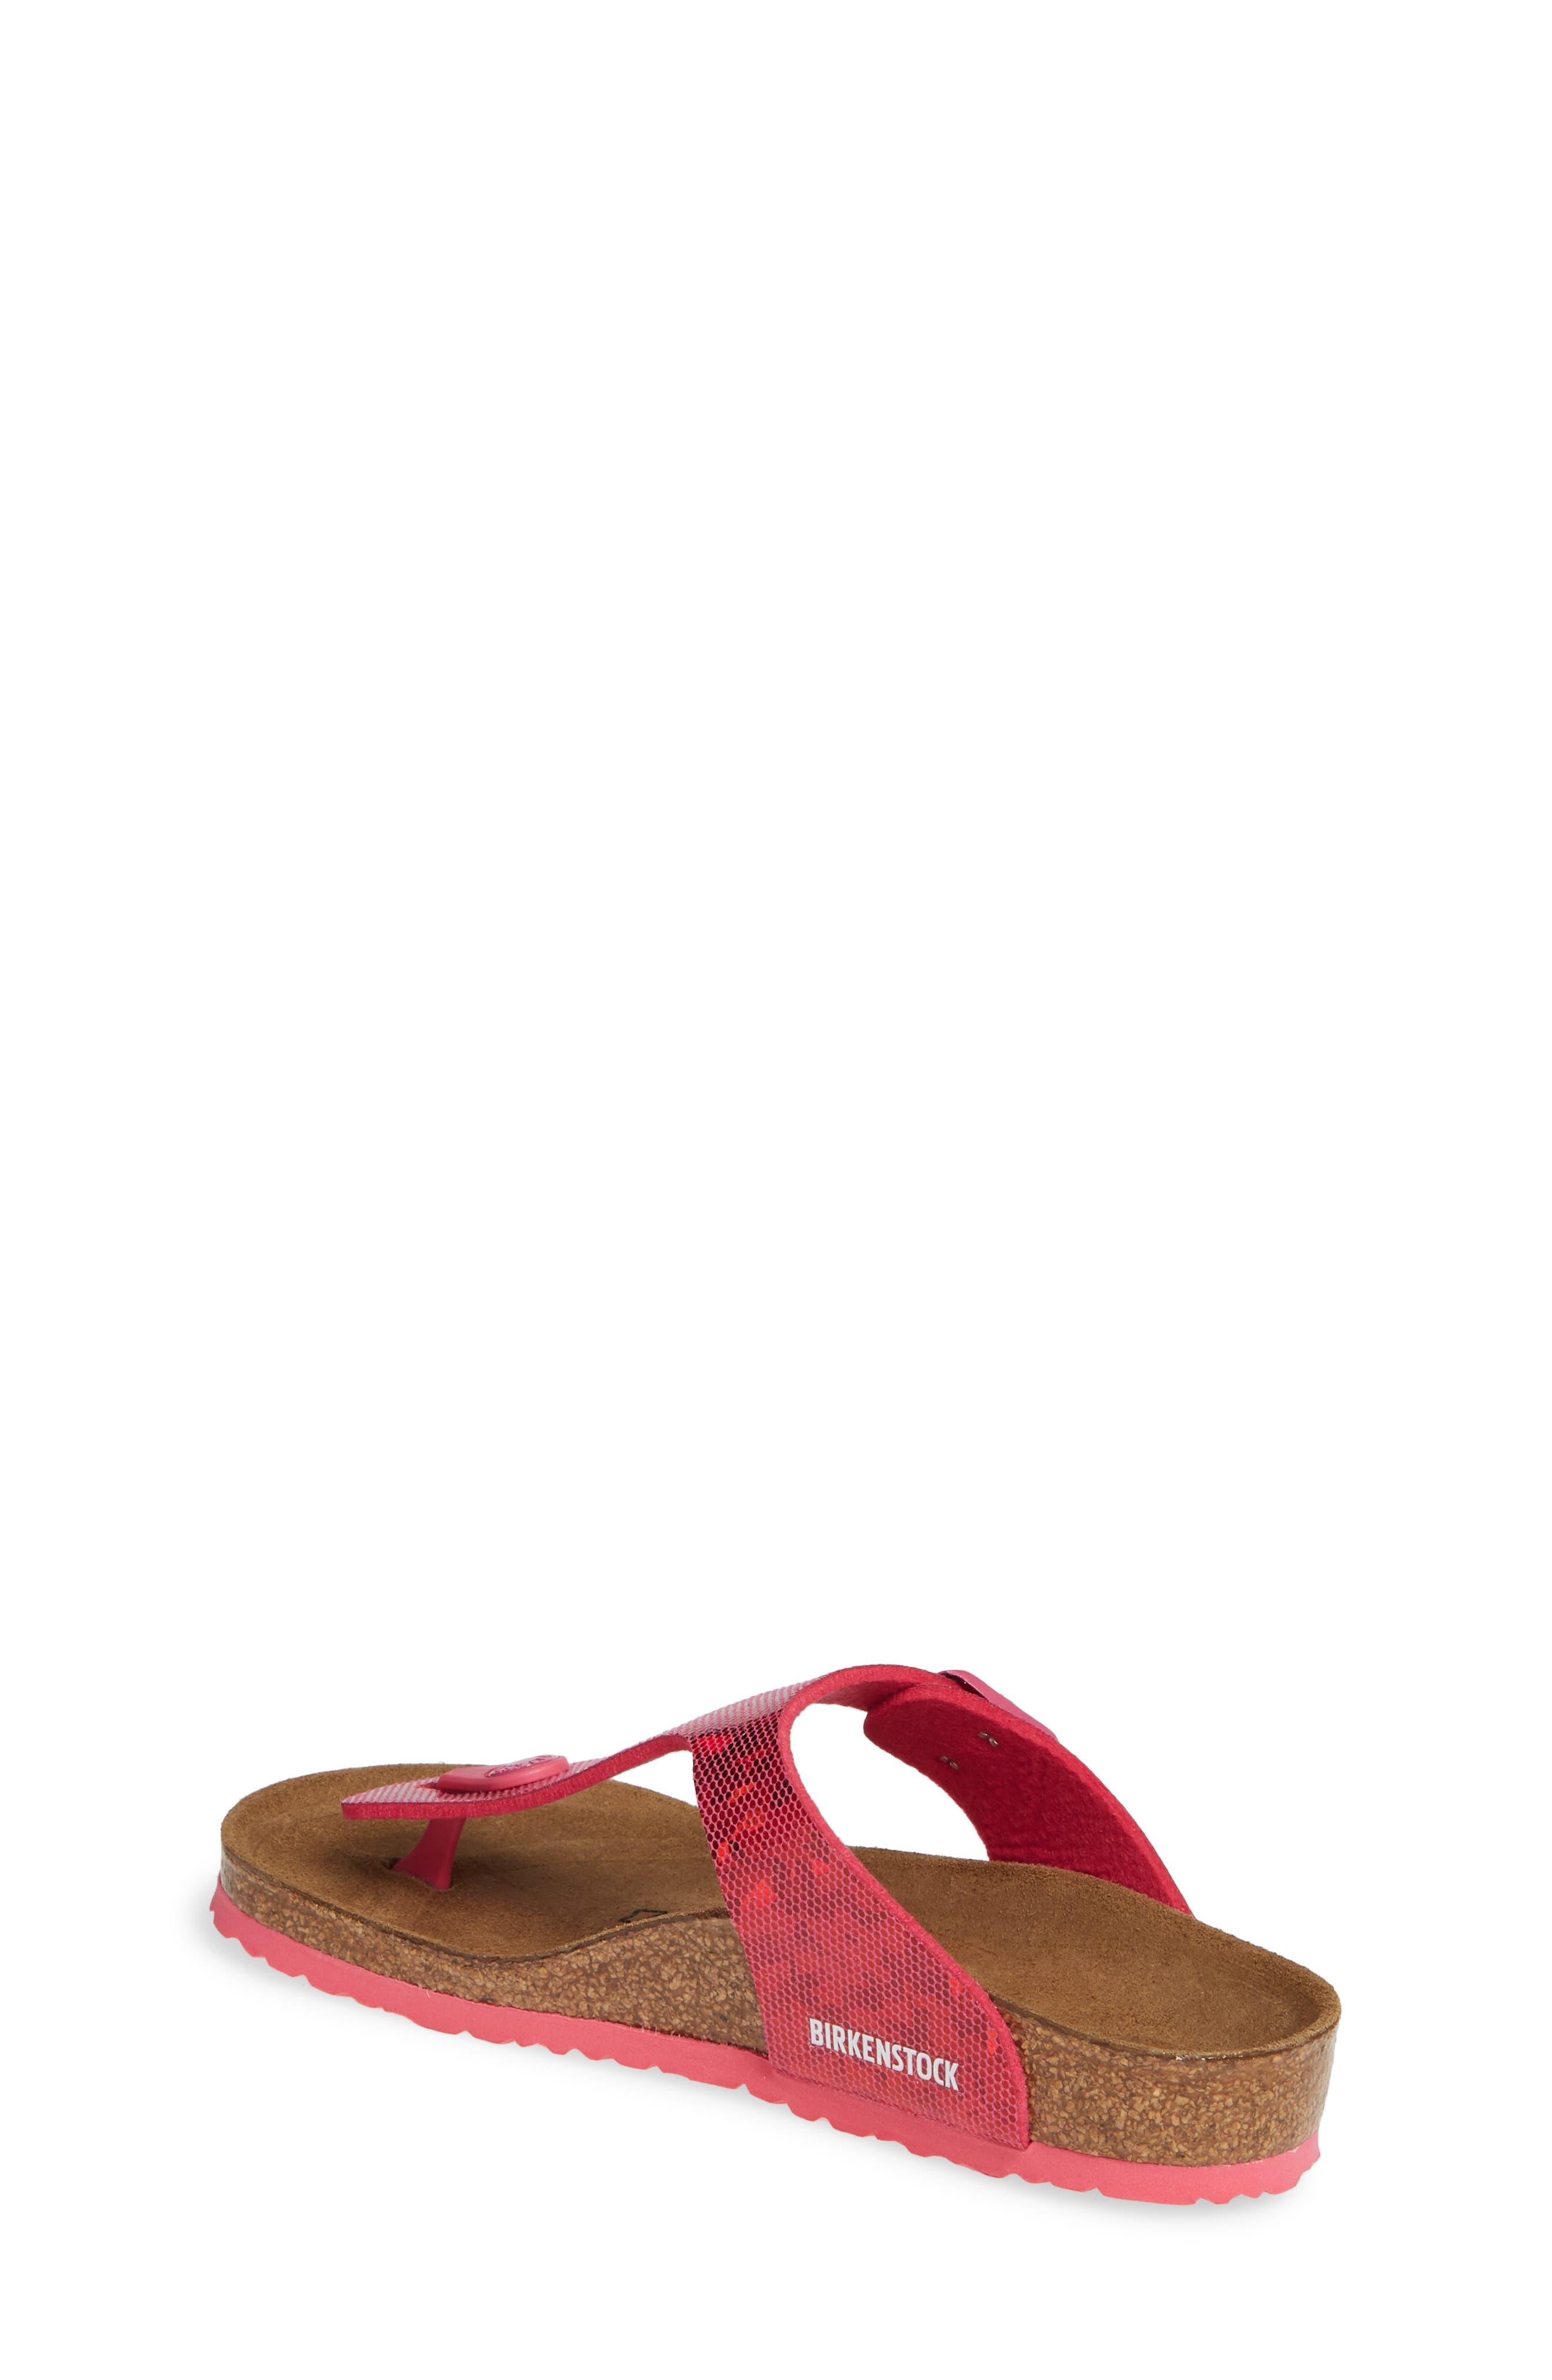 8a2bac02ce9e Girls  Birkenstock Shoes